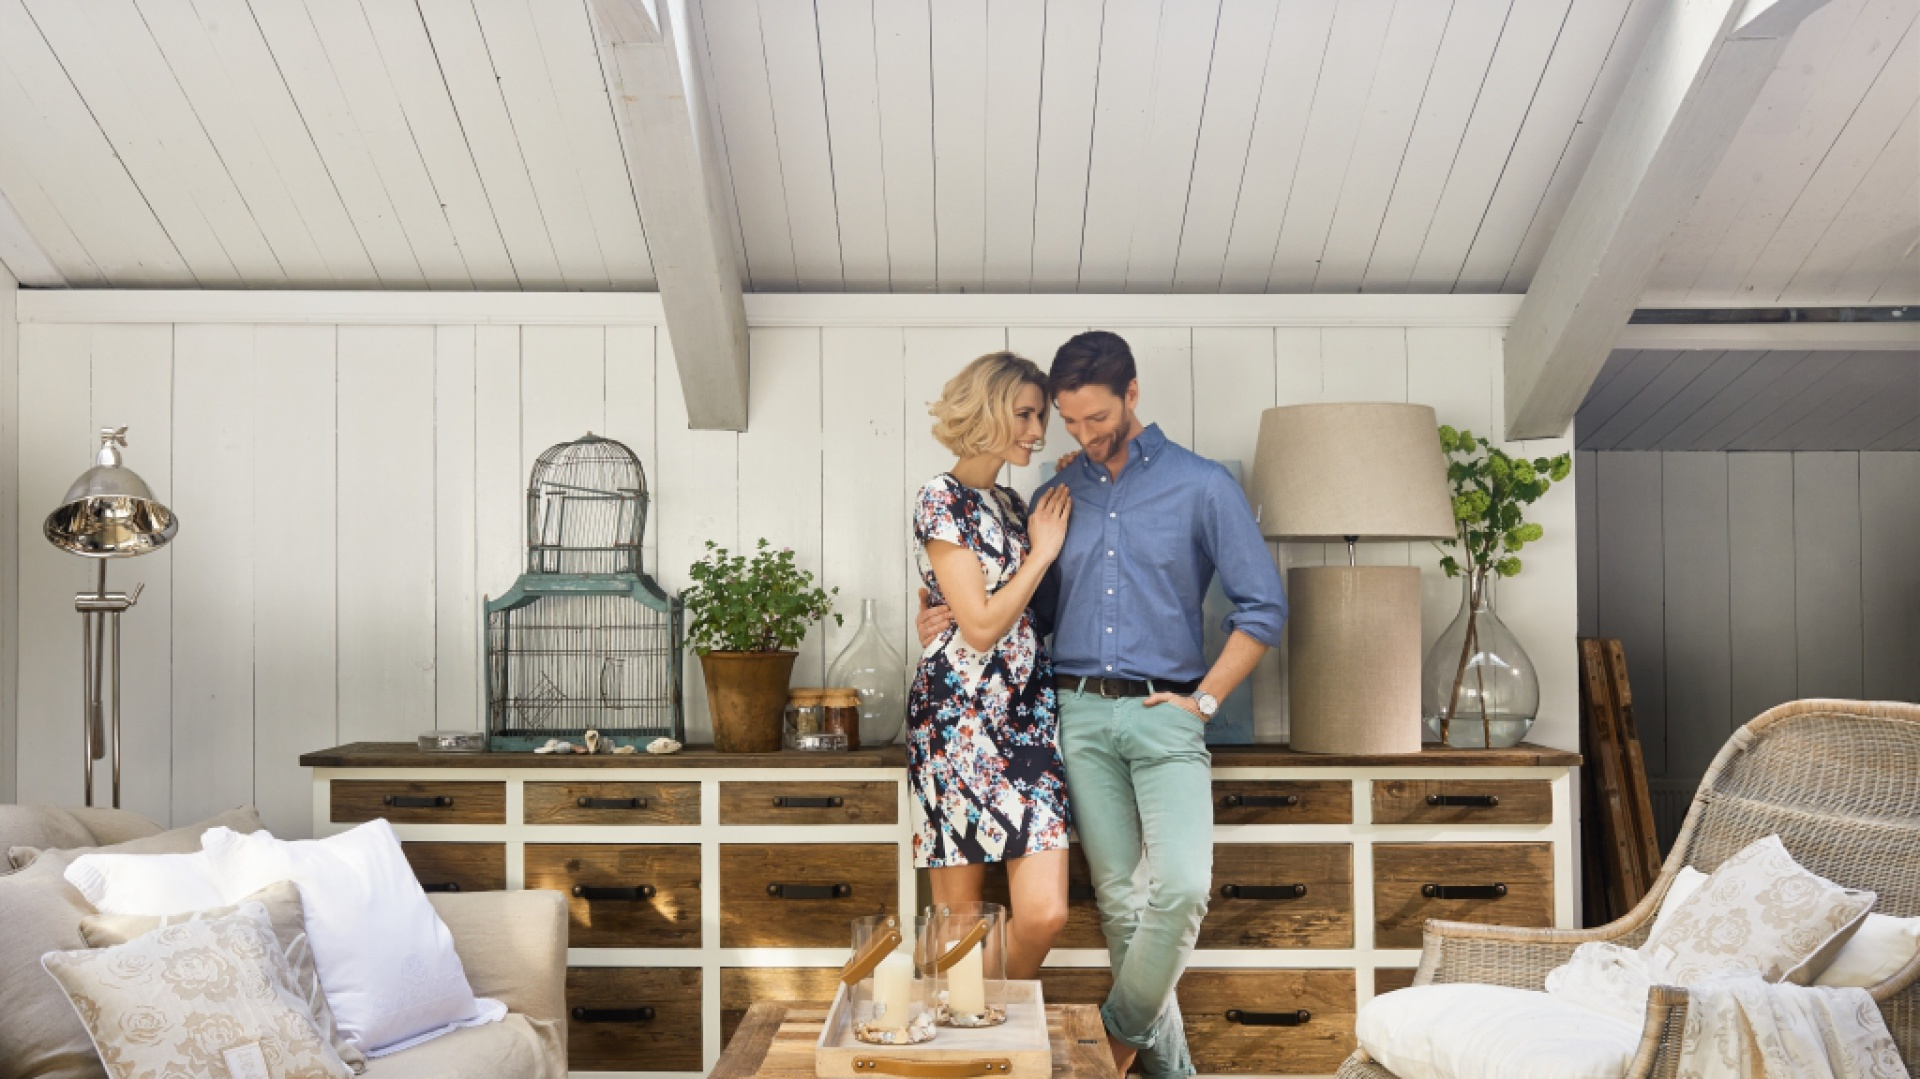 Nowa kolekcja House&More w stylu Hampton. Fot. House&More,